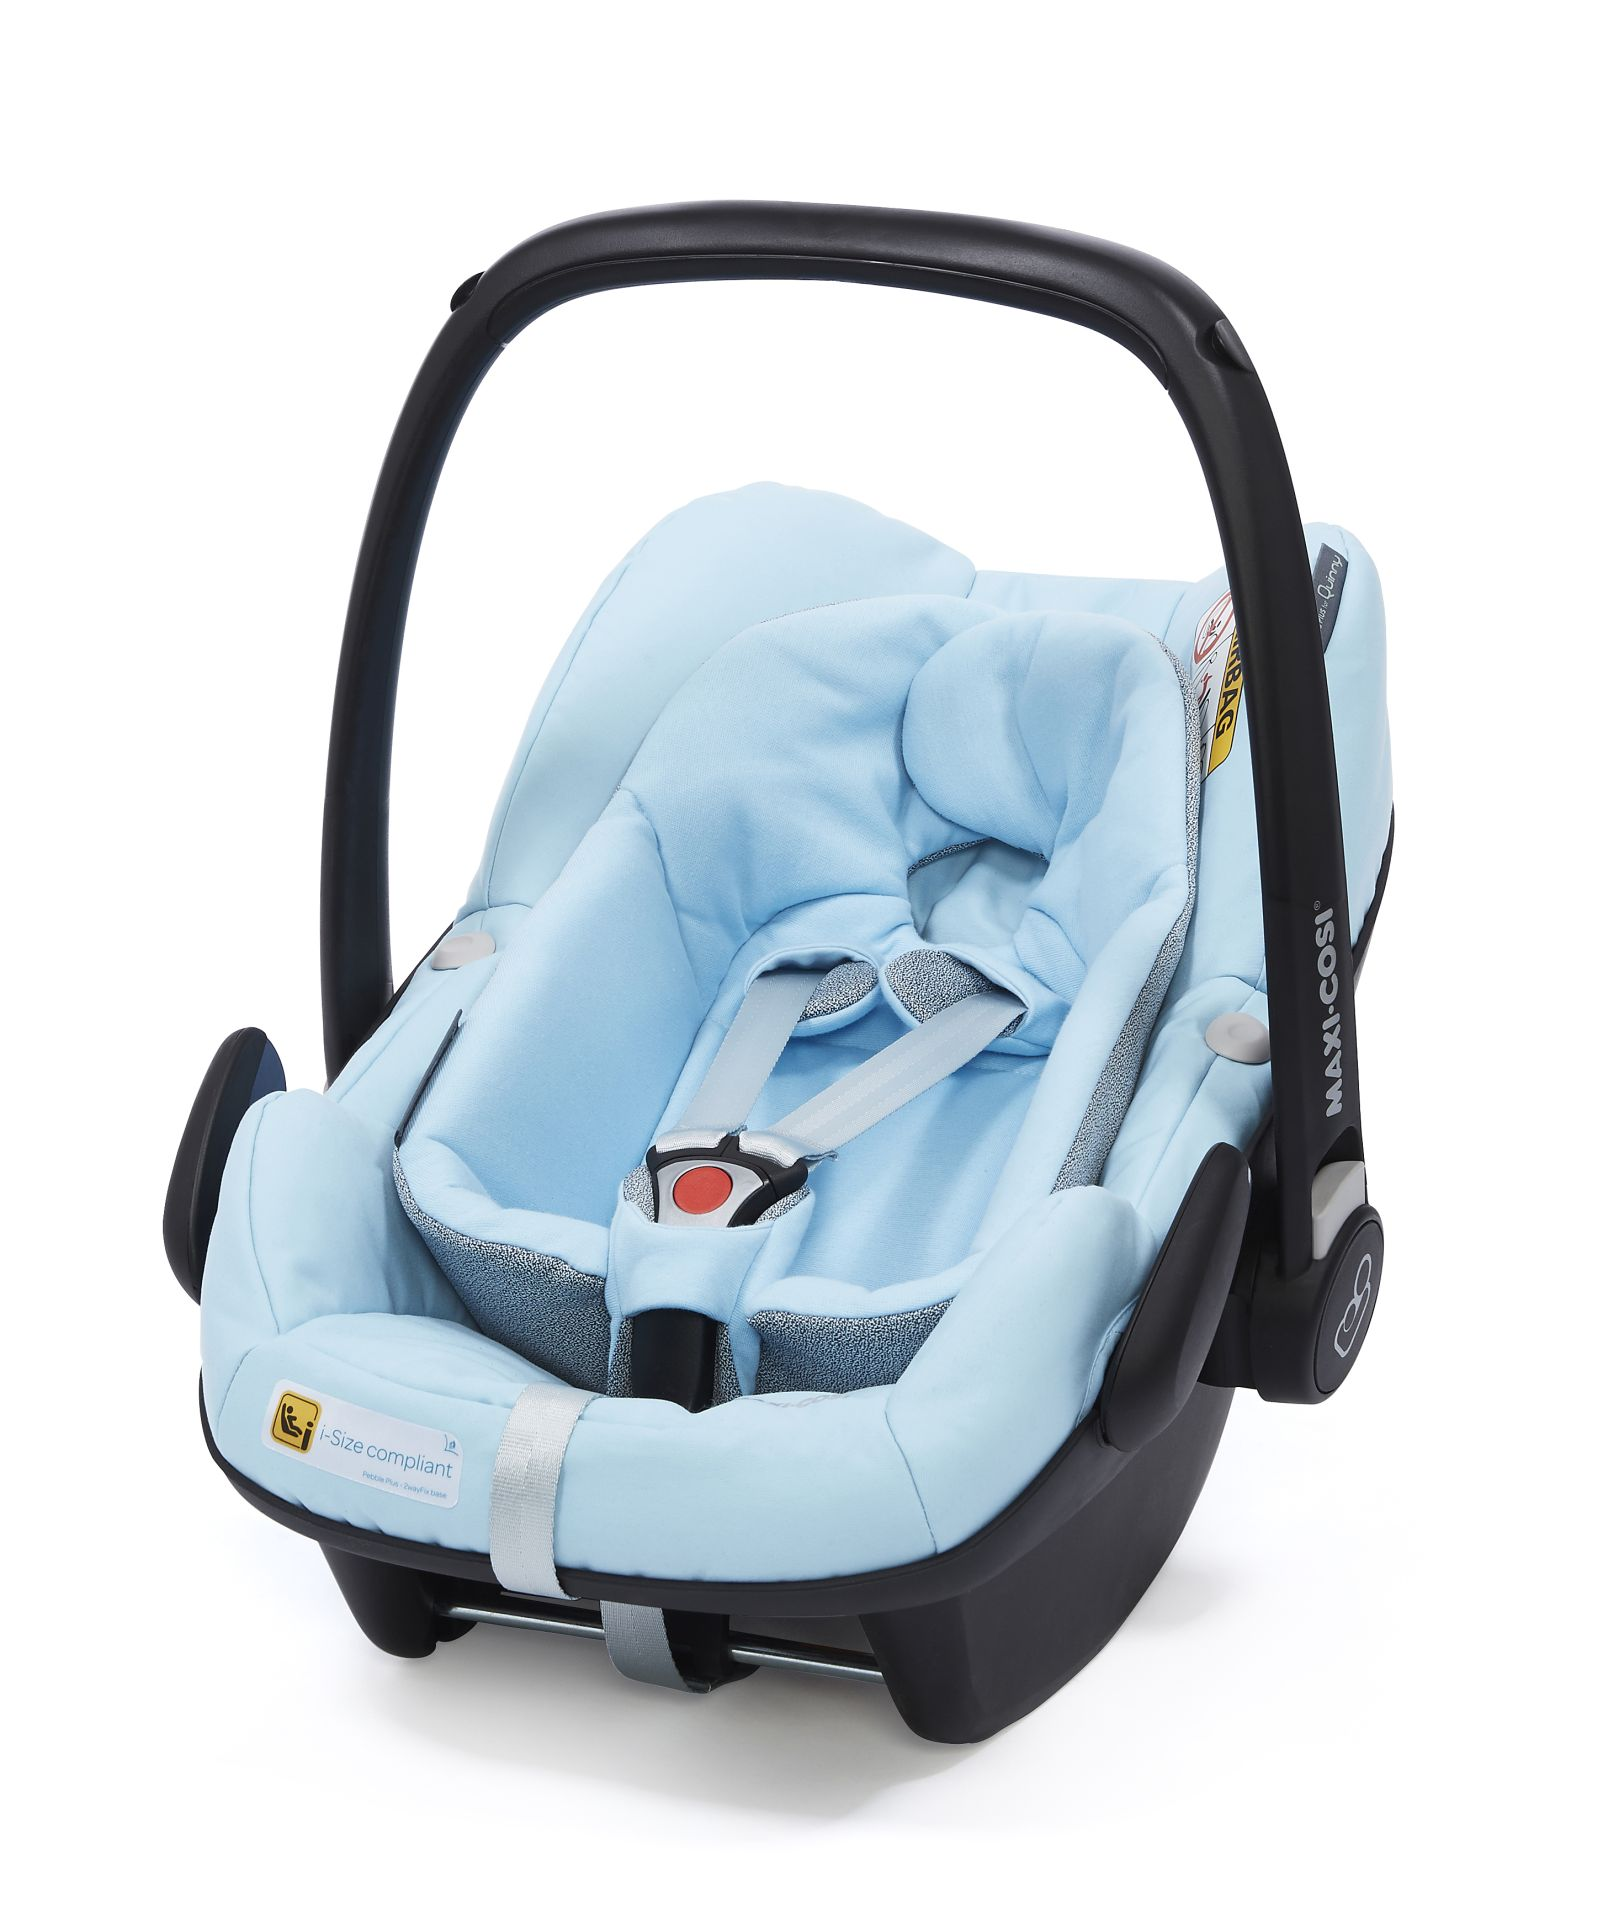 maxi cosi infant car seat pebble plus 2019 sky q design buy at kidsroom car seats. Black Bedroom Furniture Sets. Home Design Ideas